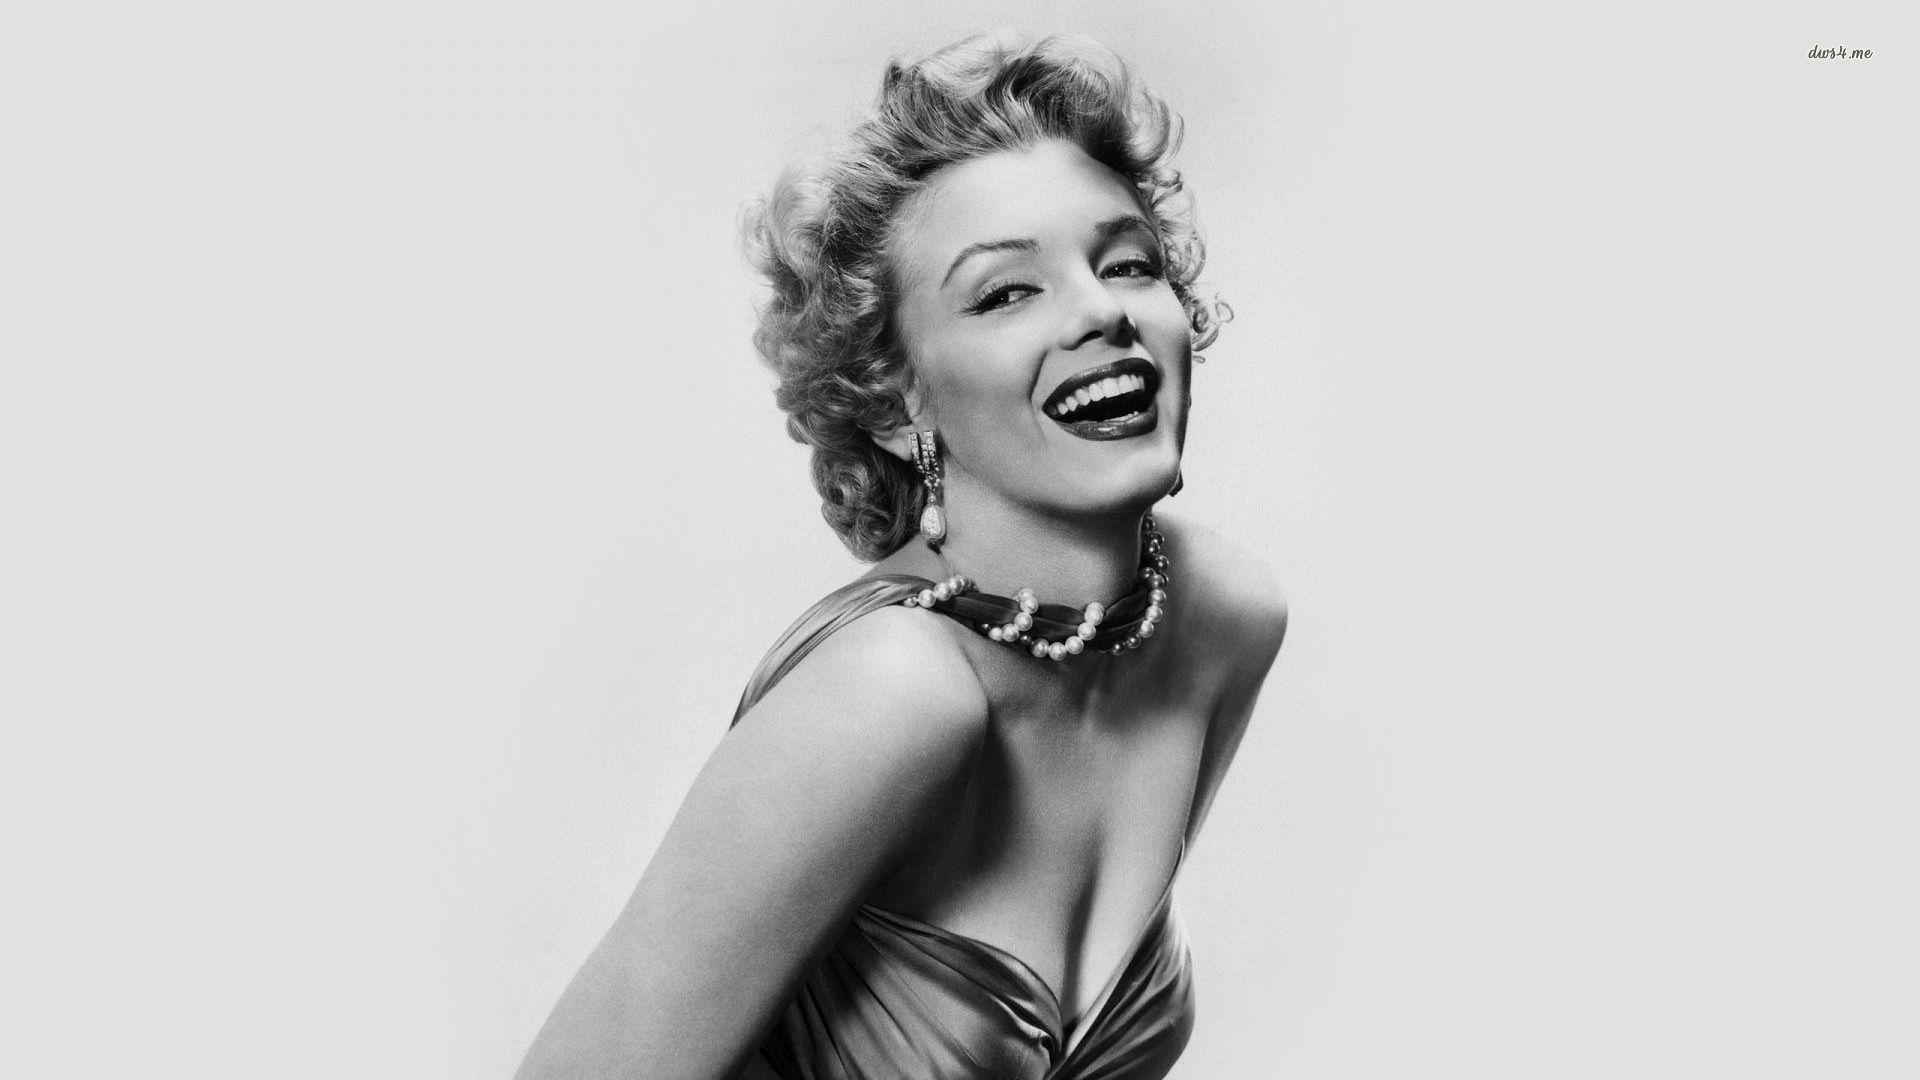 Marilyn monroe pictures images - Marilyn monroe wallpaper download ...